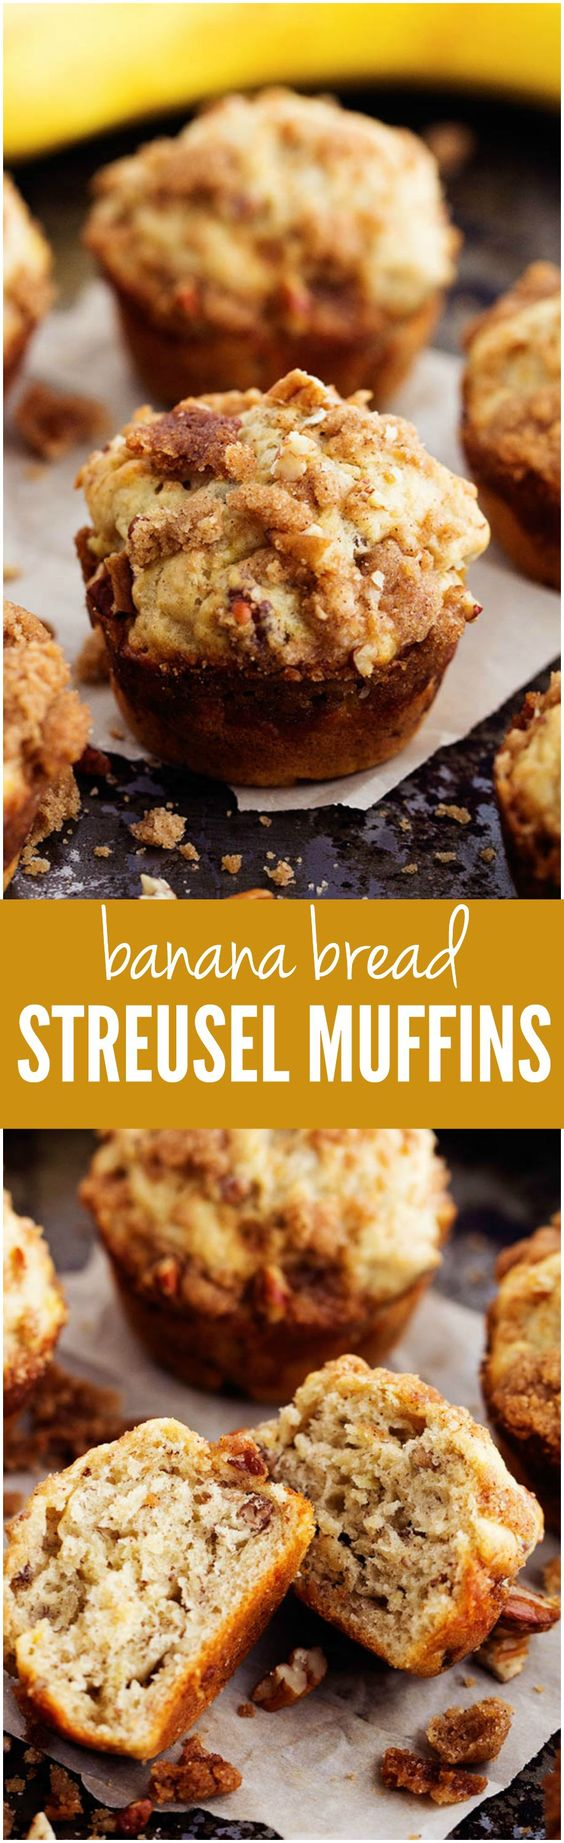 Bread Streusel Muffins | Recipe | Banana Bread Muffins, Streusel ...